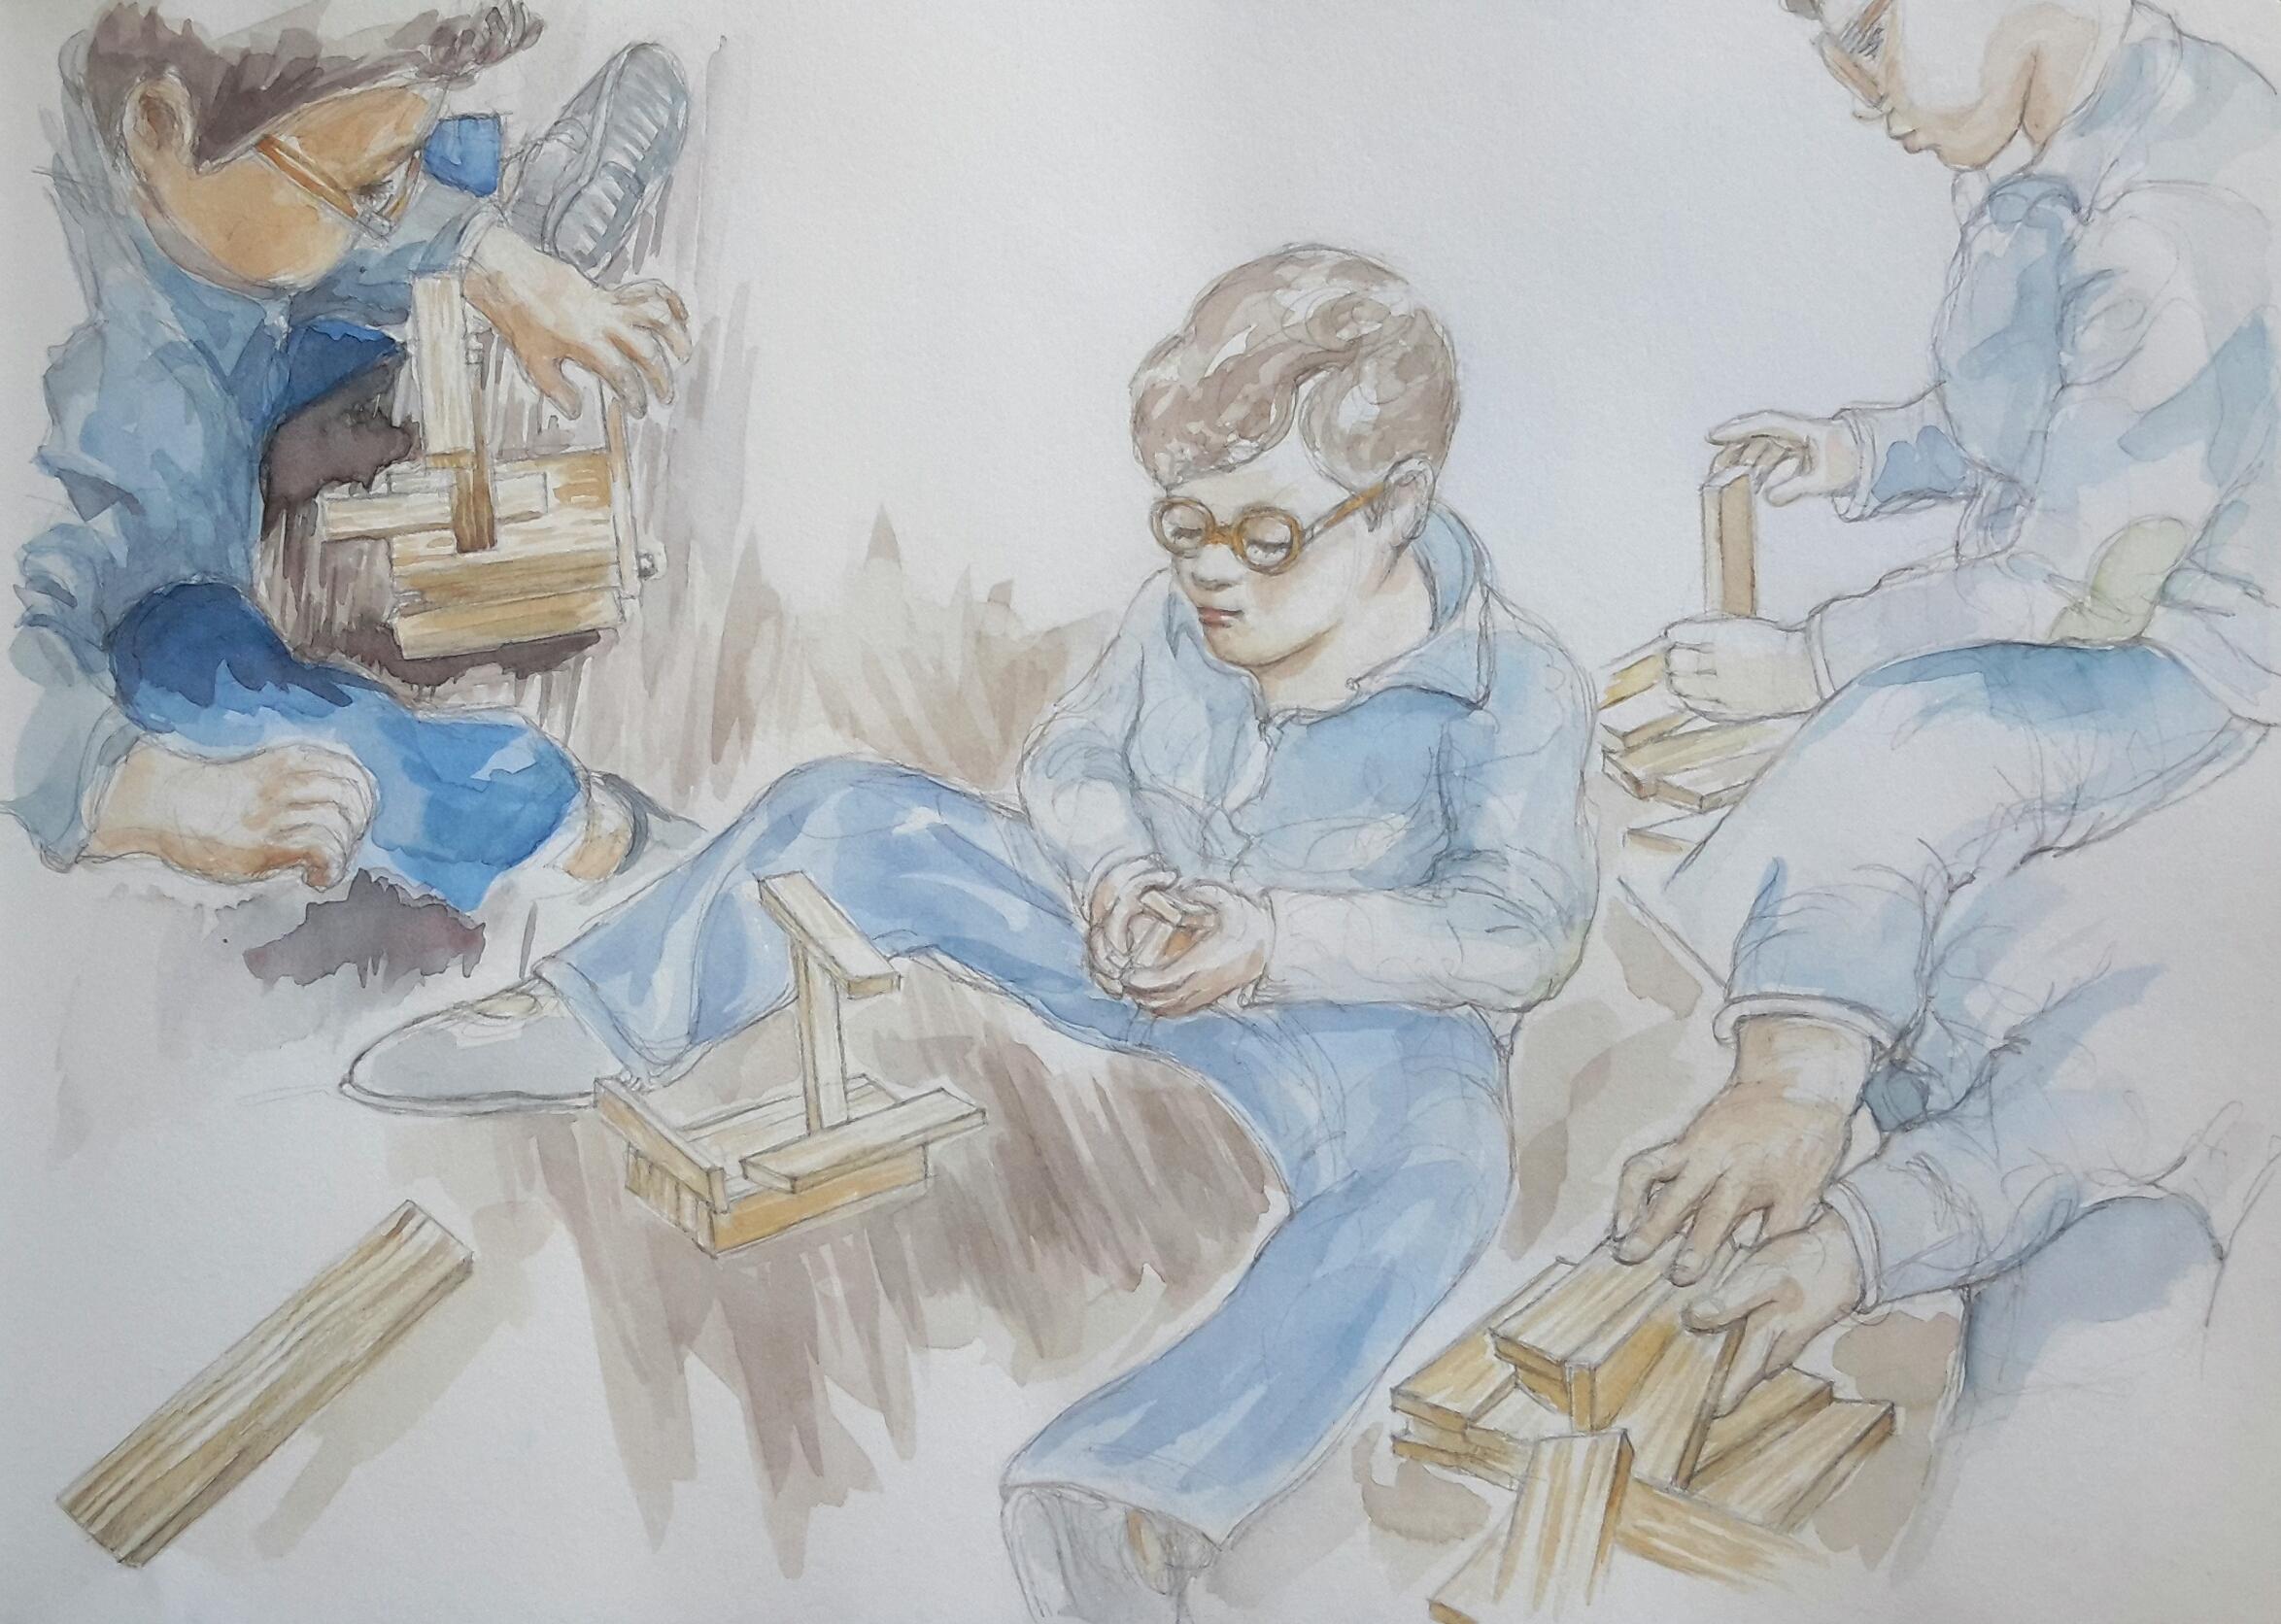 Charlie 4 : illustration aquarelle